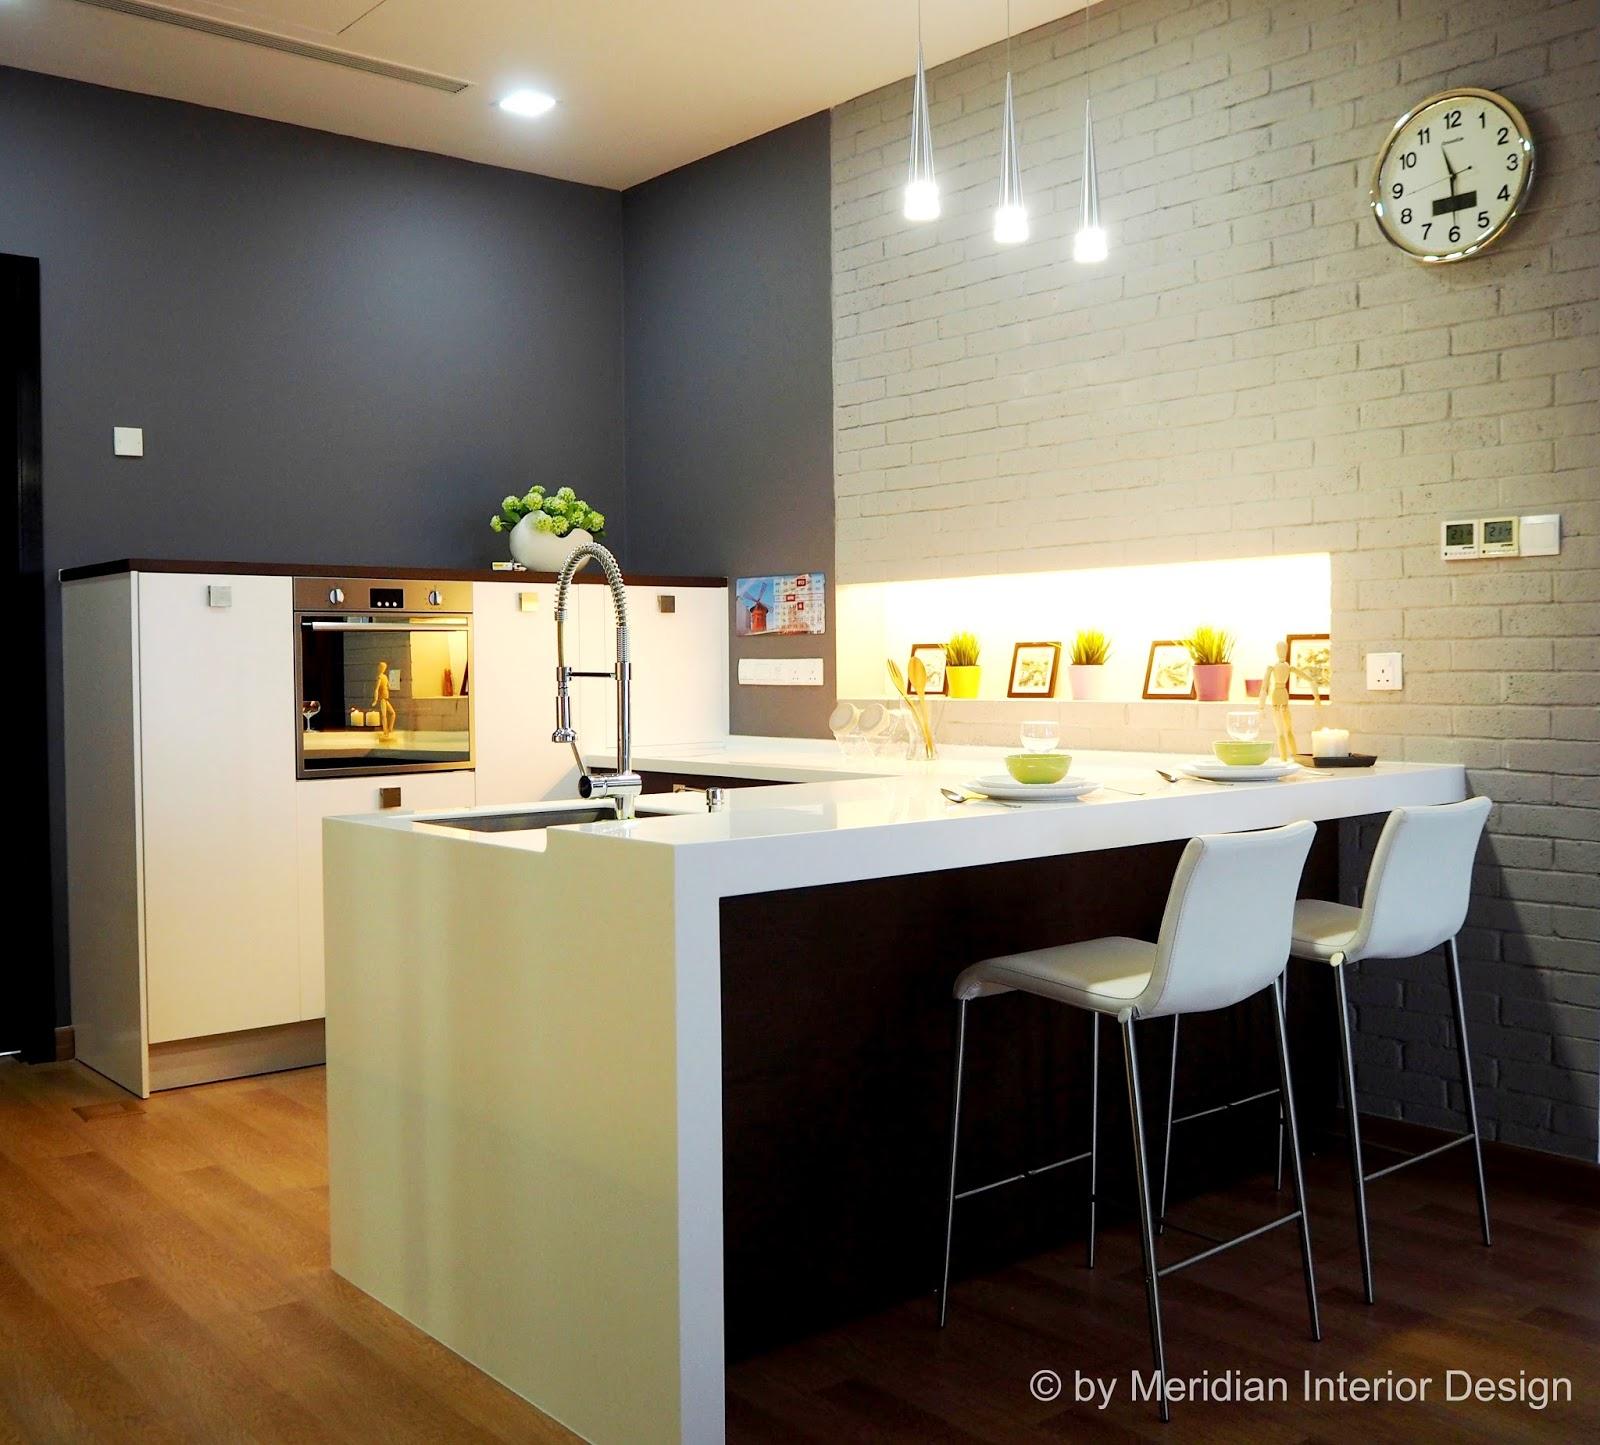 Small kitchen design kuala lumpur cabinet malaysia ideas for Kitchen ideas malaysia